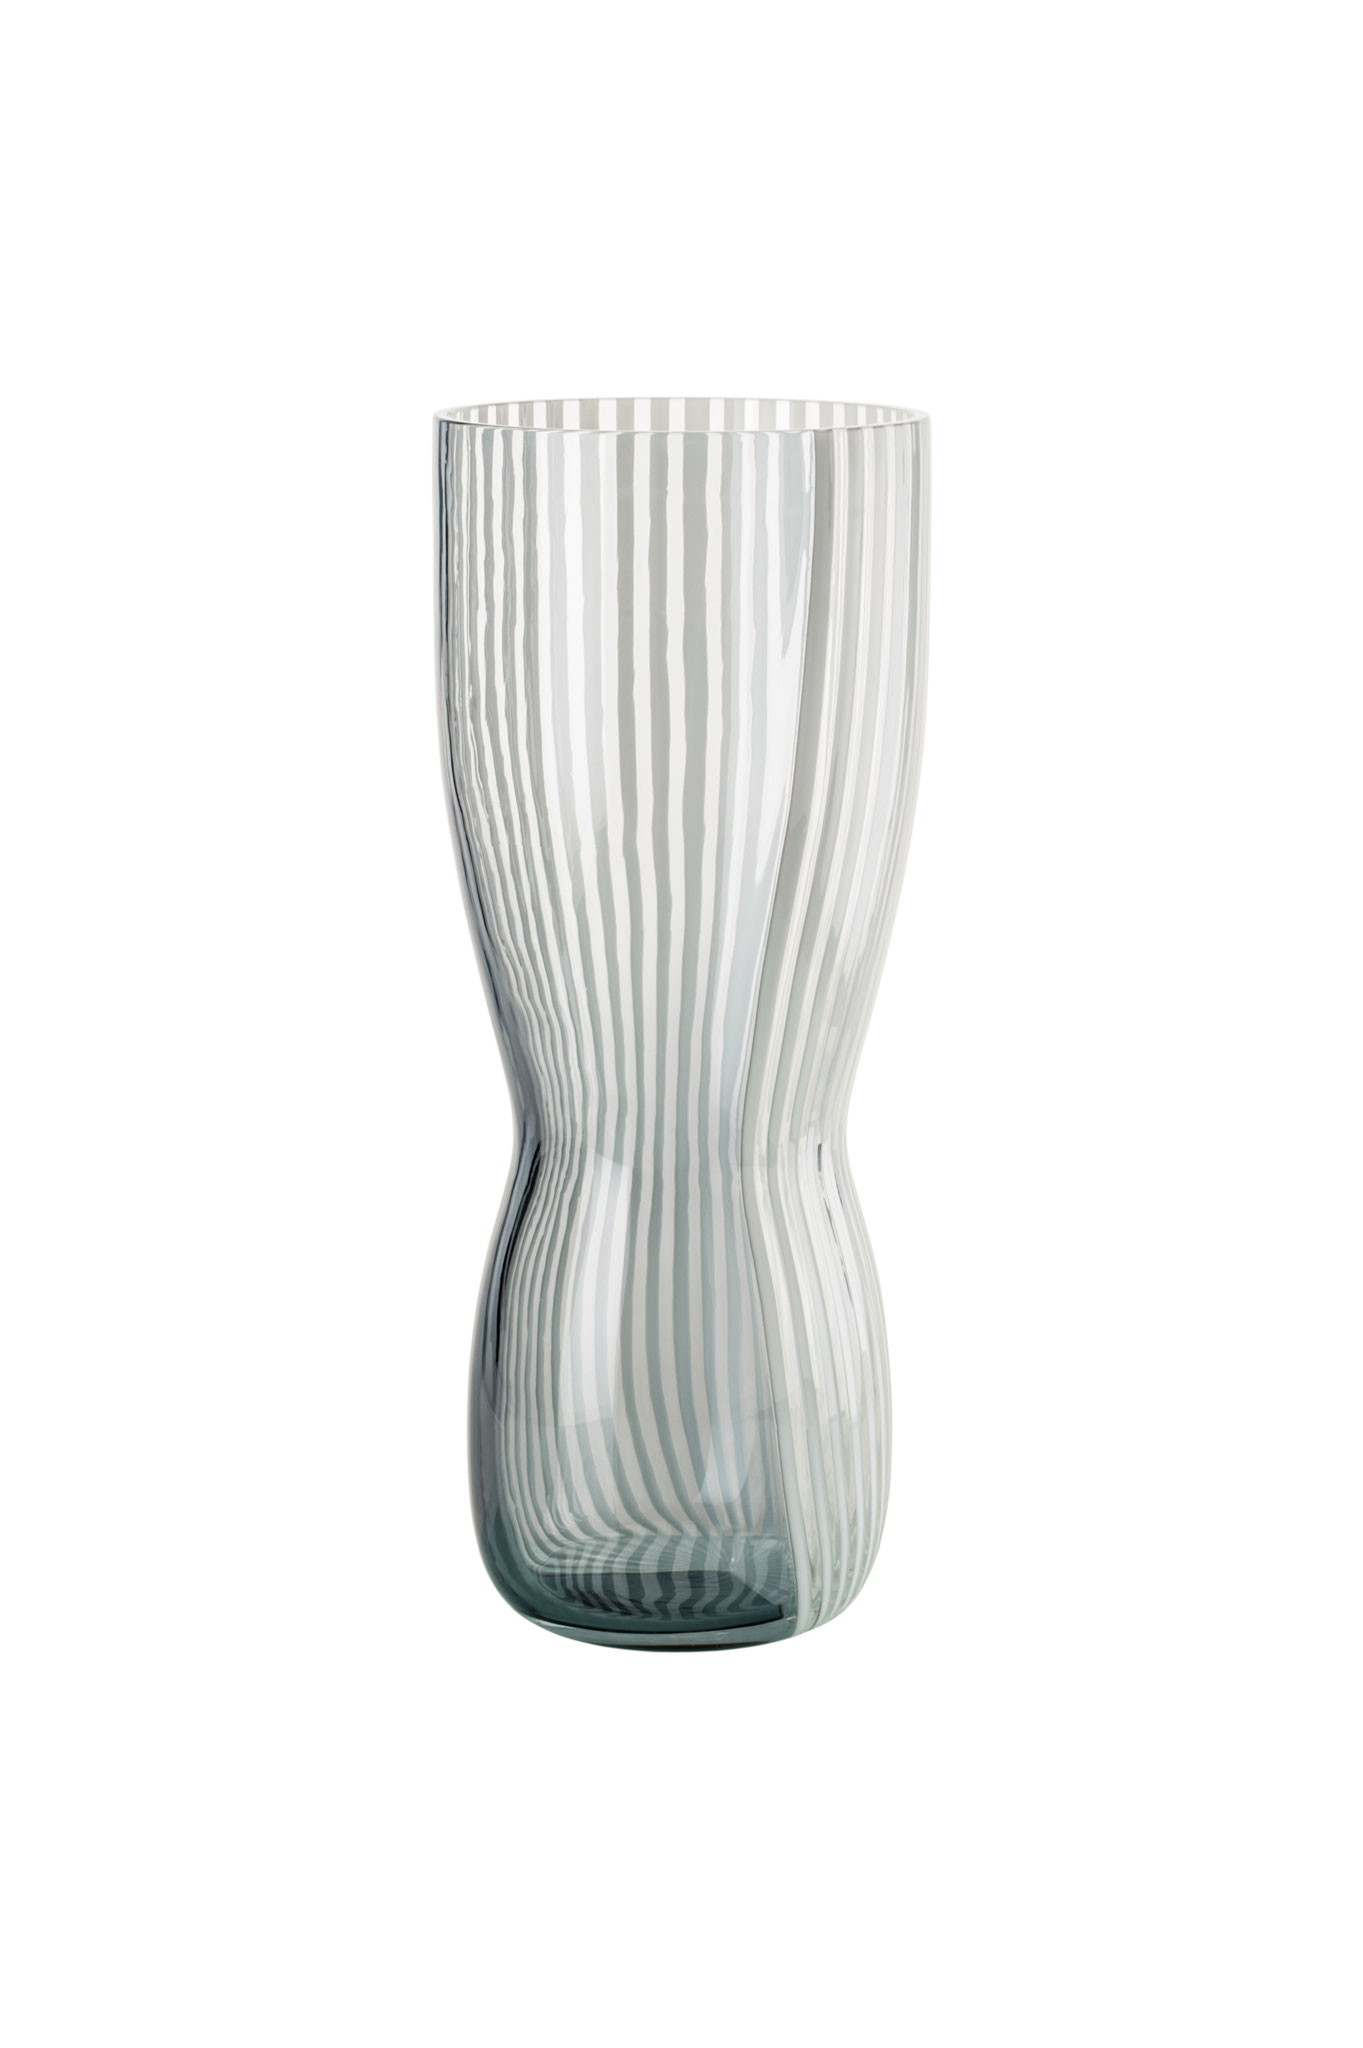 VENINI, Vase CINETICI, H.37cm, lattimo, nummeriert, € 1.450,00